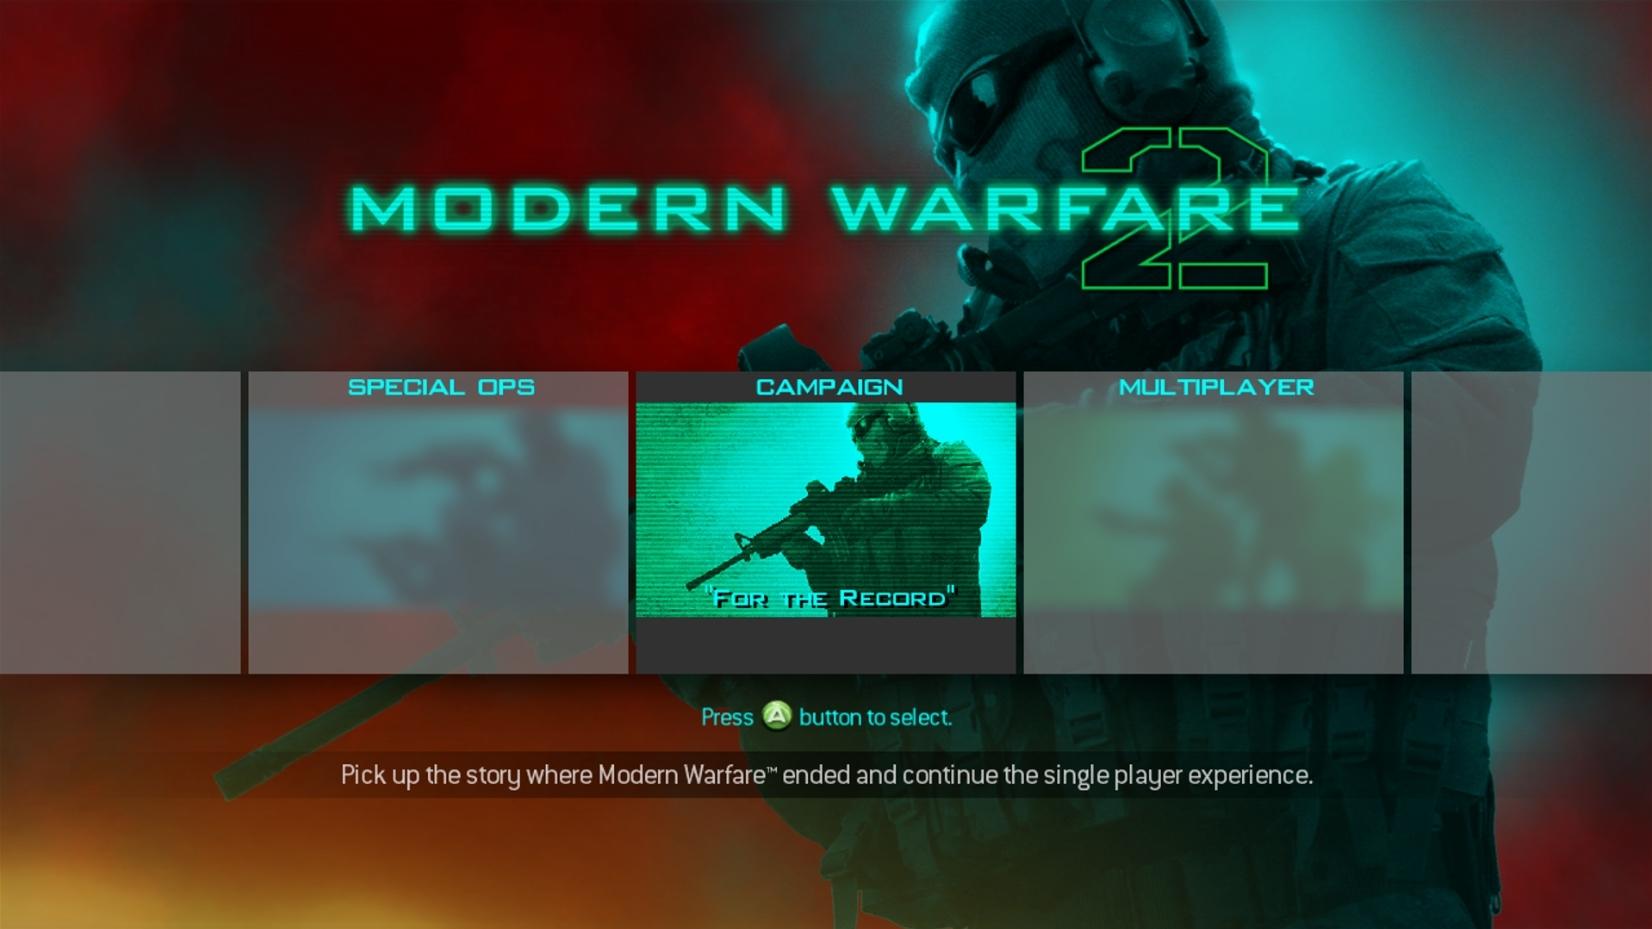 Custom Ui Mods Call Of Duty Modern Warfare 2 Modding Se7ensins Gaming Community